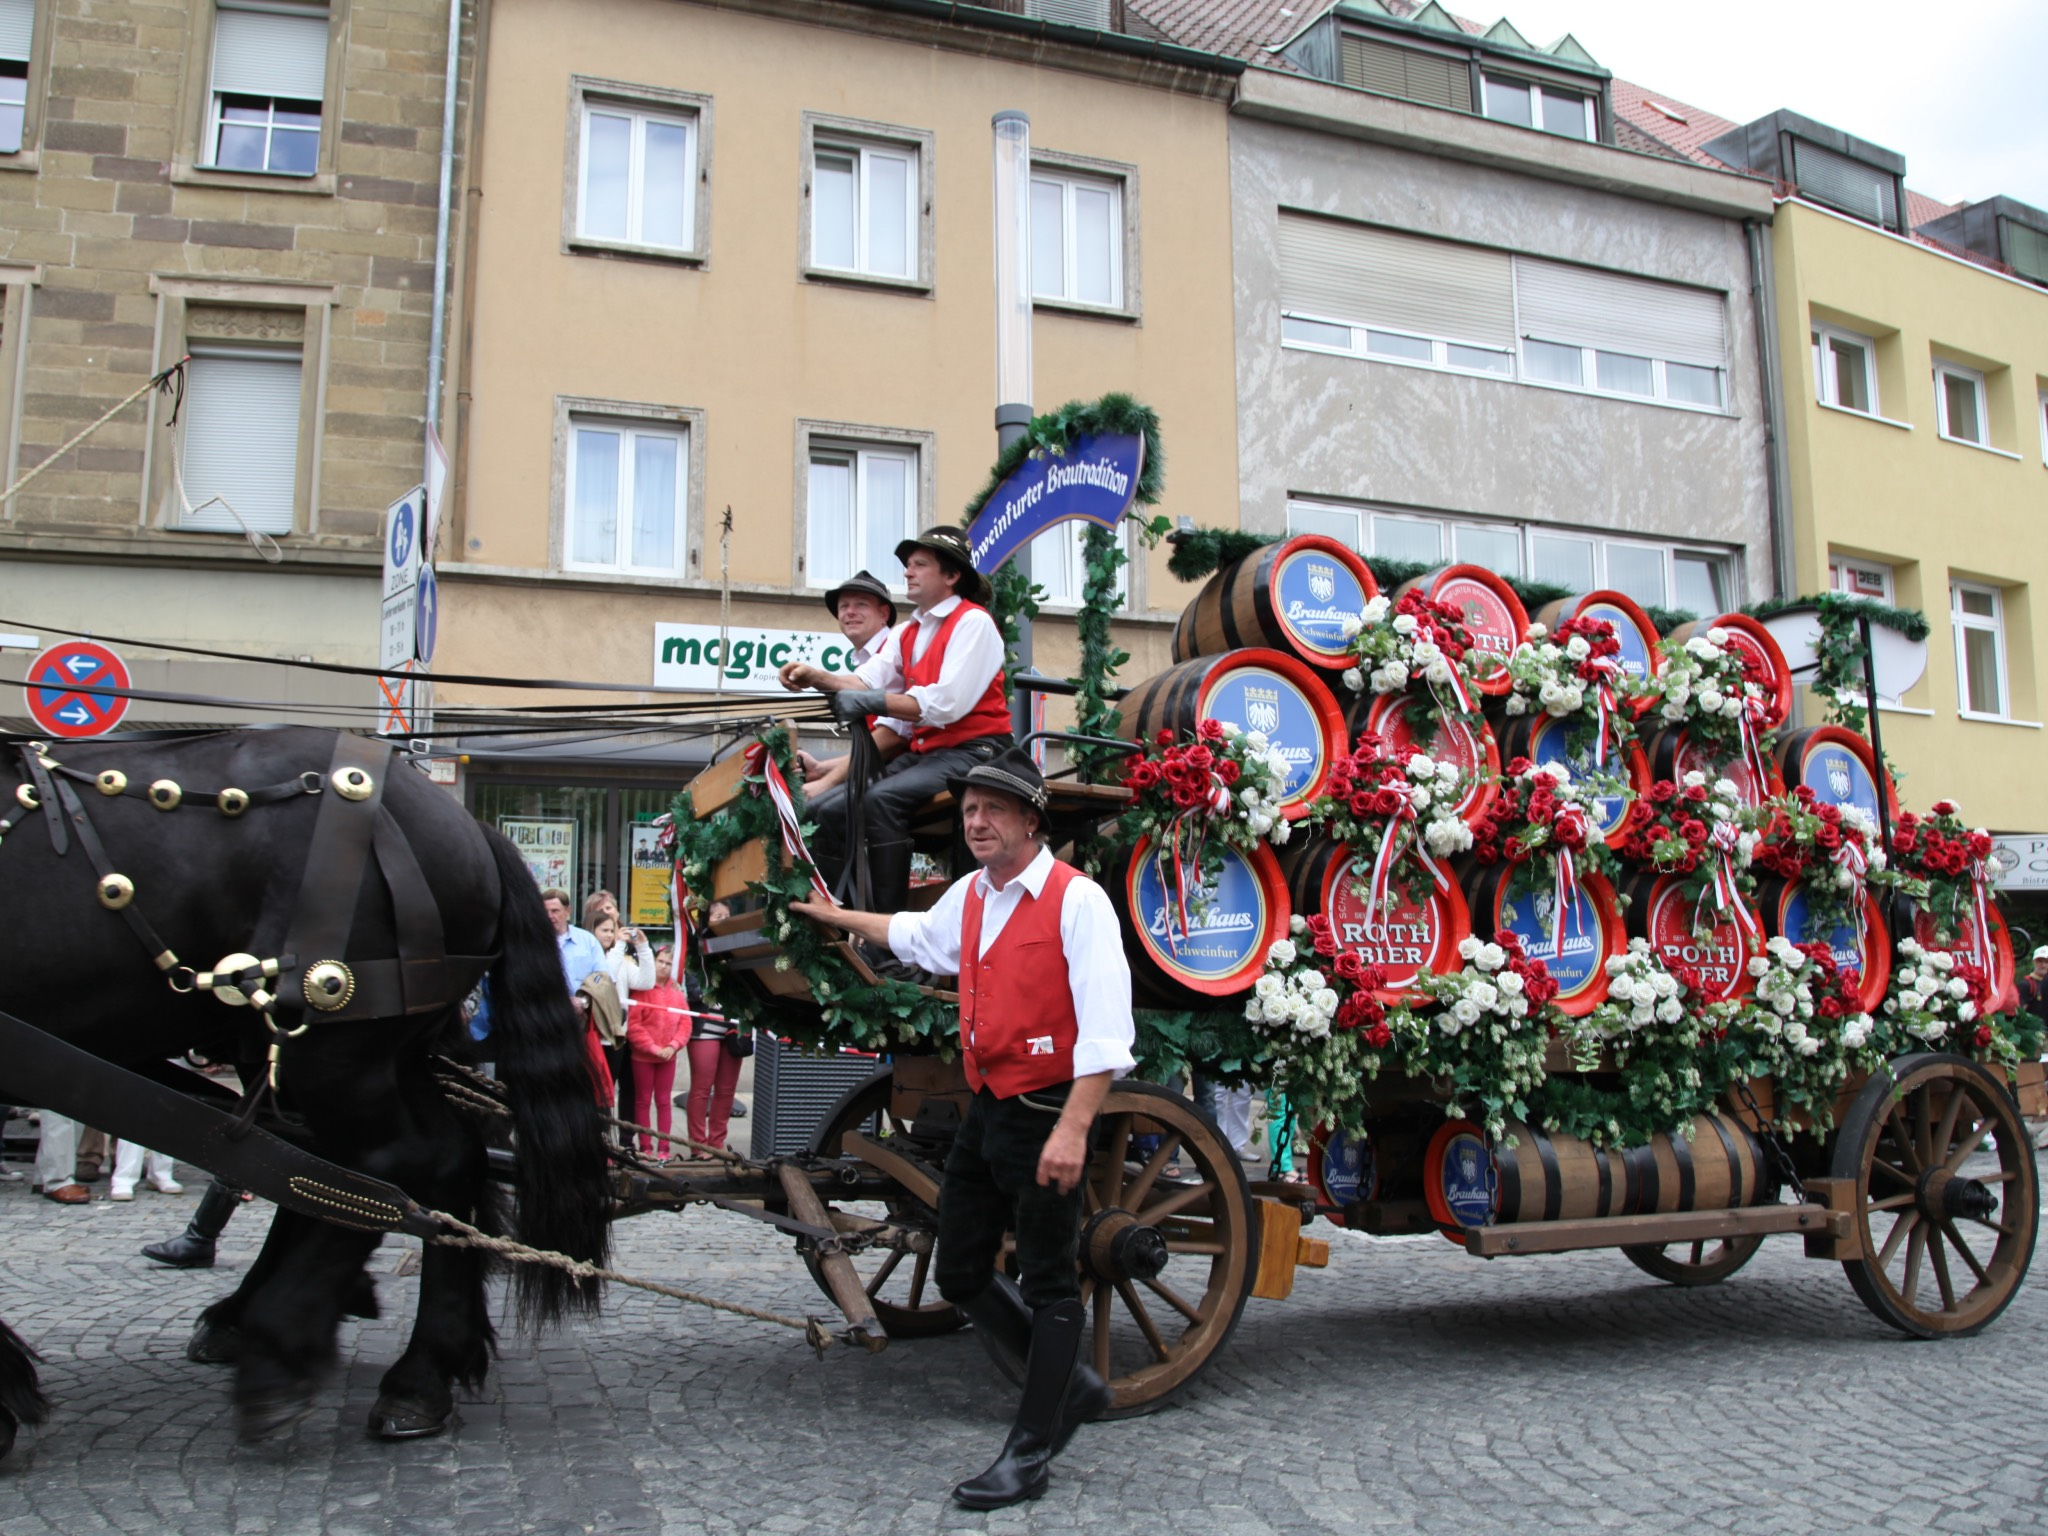 Kutsche am Volksfestumzug. Foto: Stefan Pfister